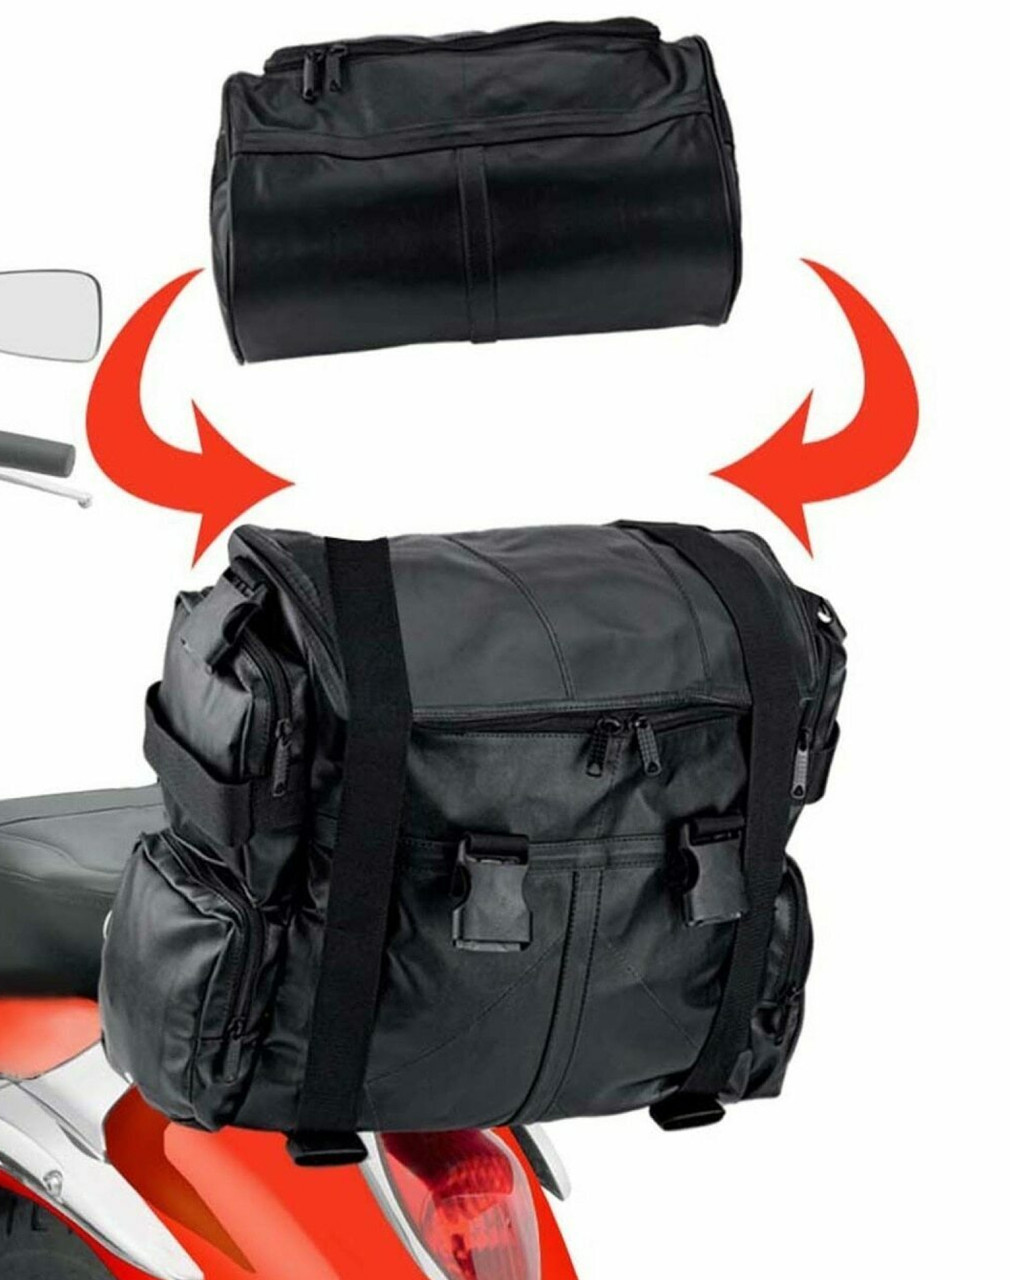 Suzuki Viking Aero Medium Expandable Motorcycle Sissy Bar Bags